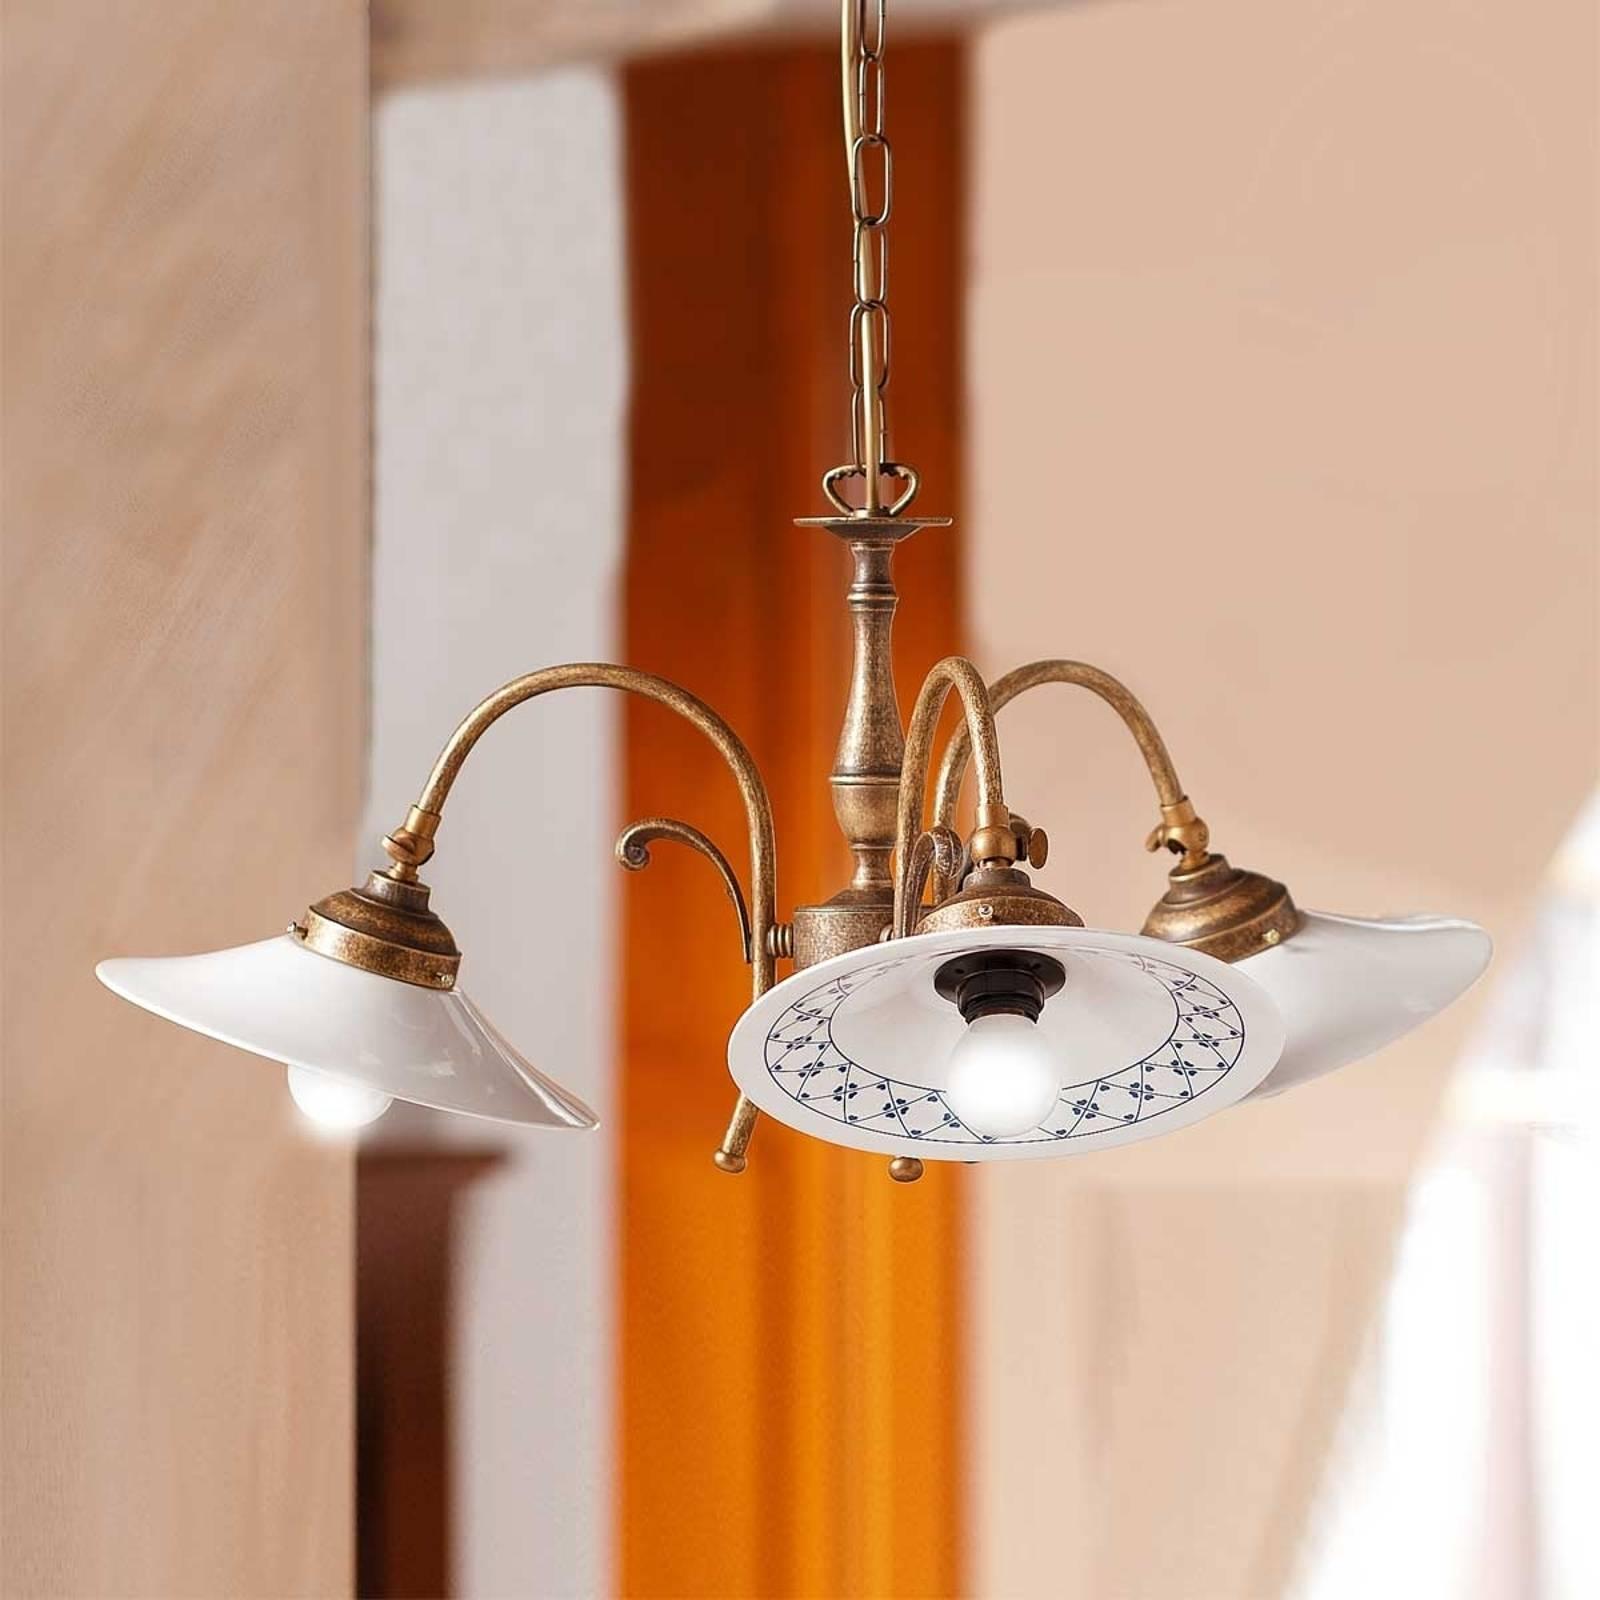 Hanglamp ORLO, 3-lichts, landelijke stijl